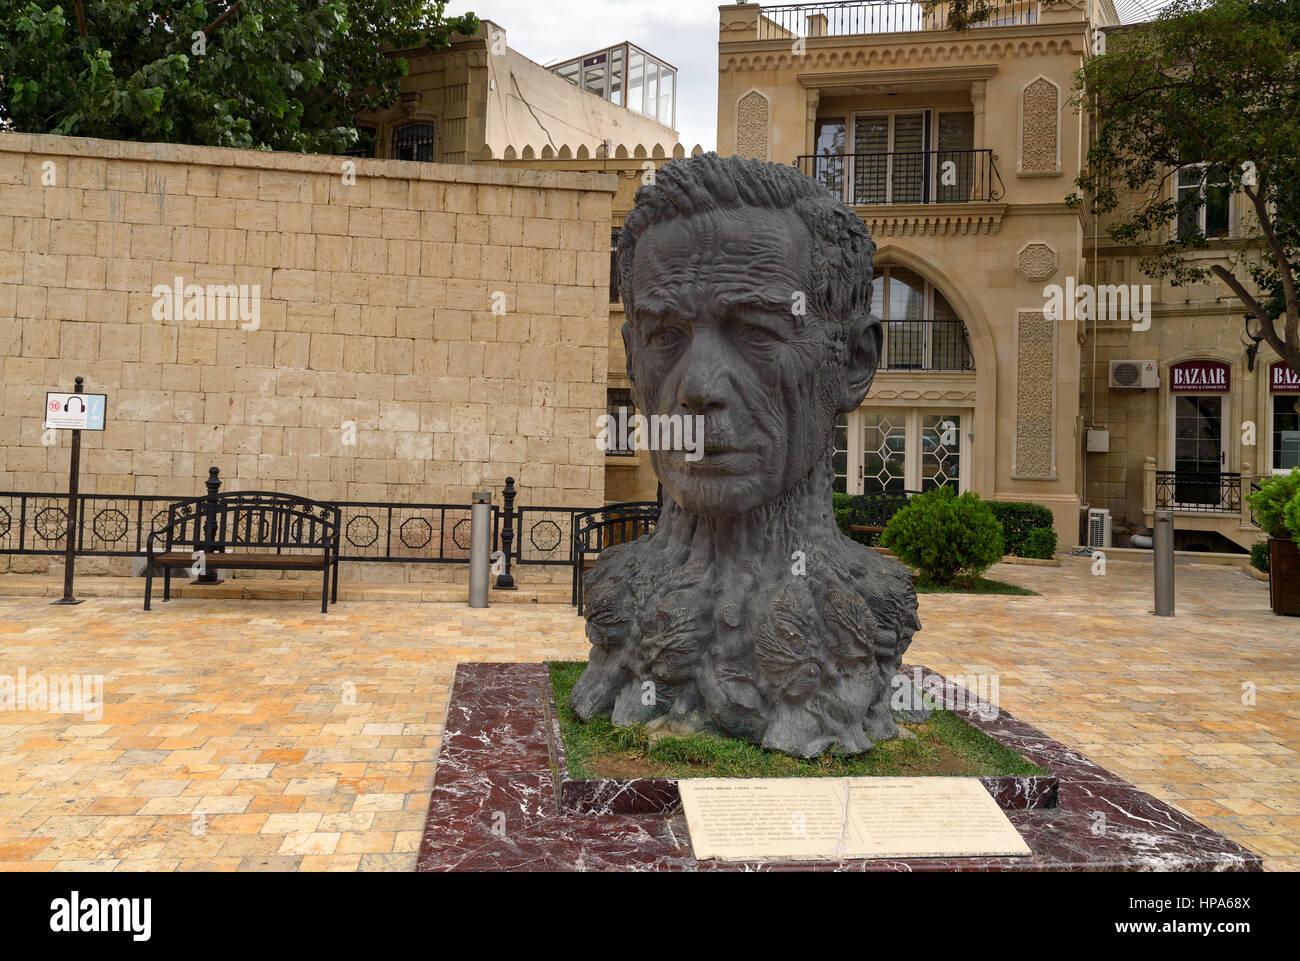 Baku, Azerbaijan - September 10, 2016: Monument to Azerbaijani poet Aliaga Vakhid in Old city, Icheri Sheher is - Stock Image